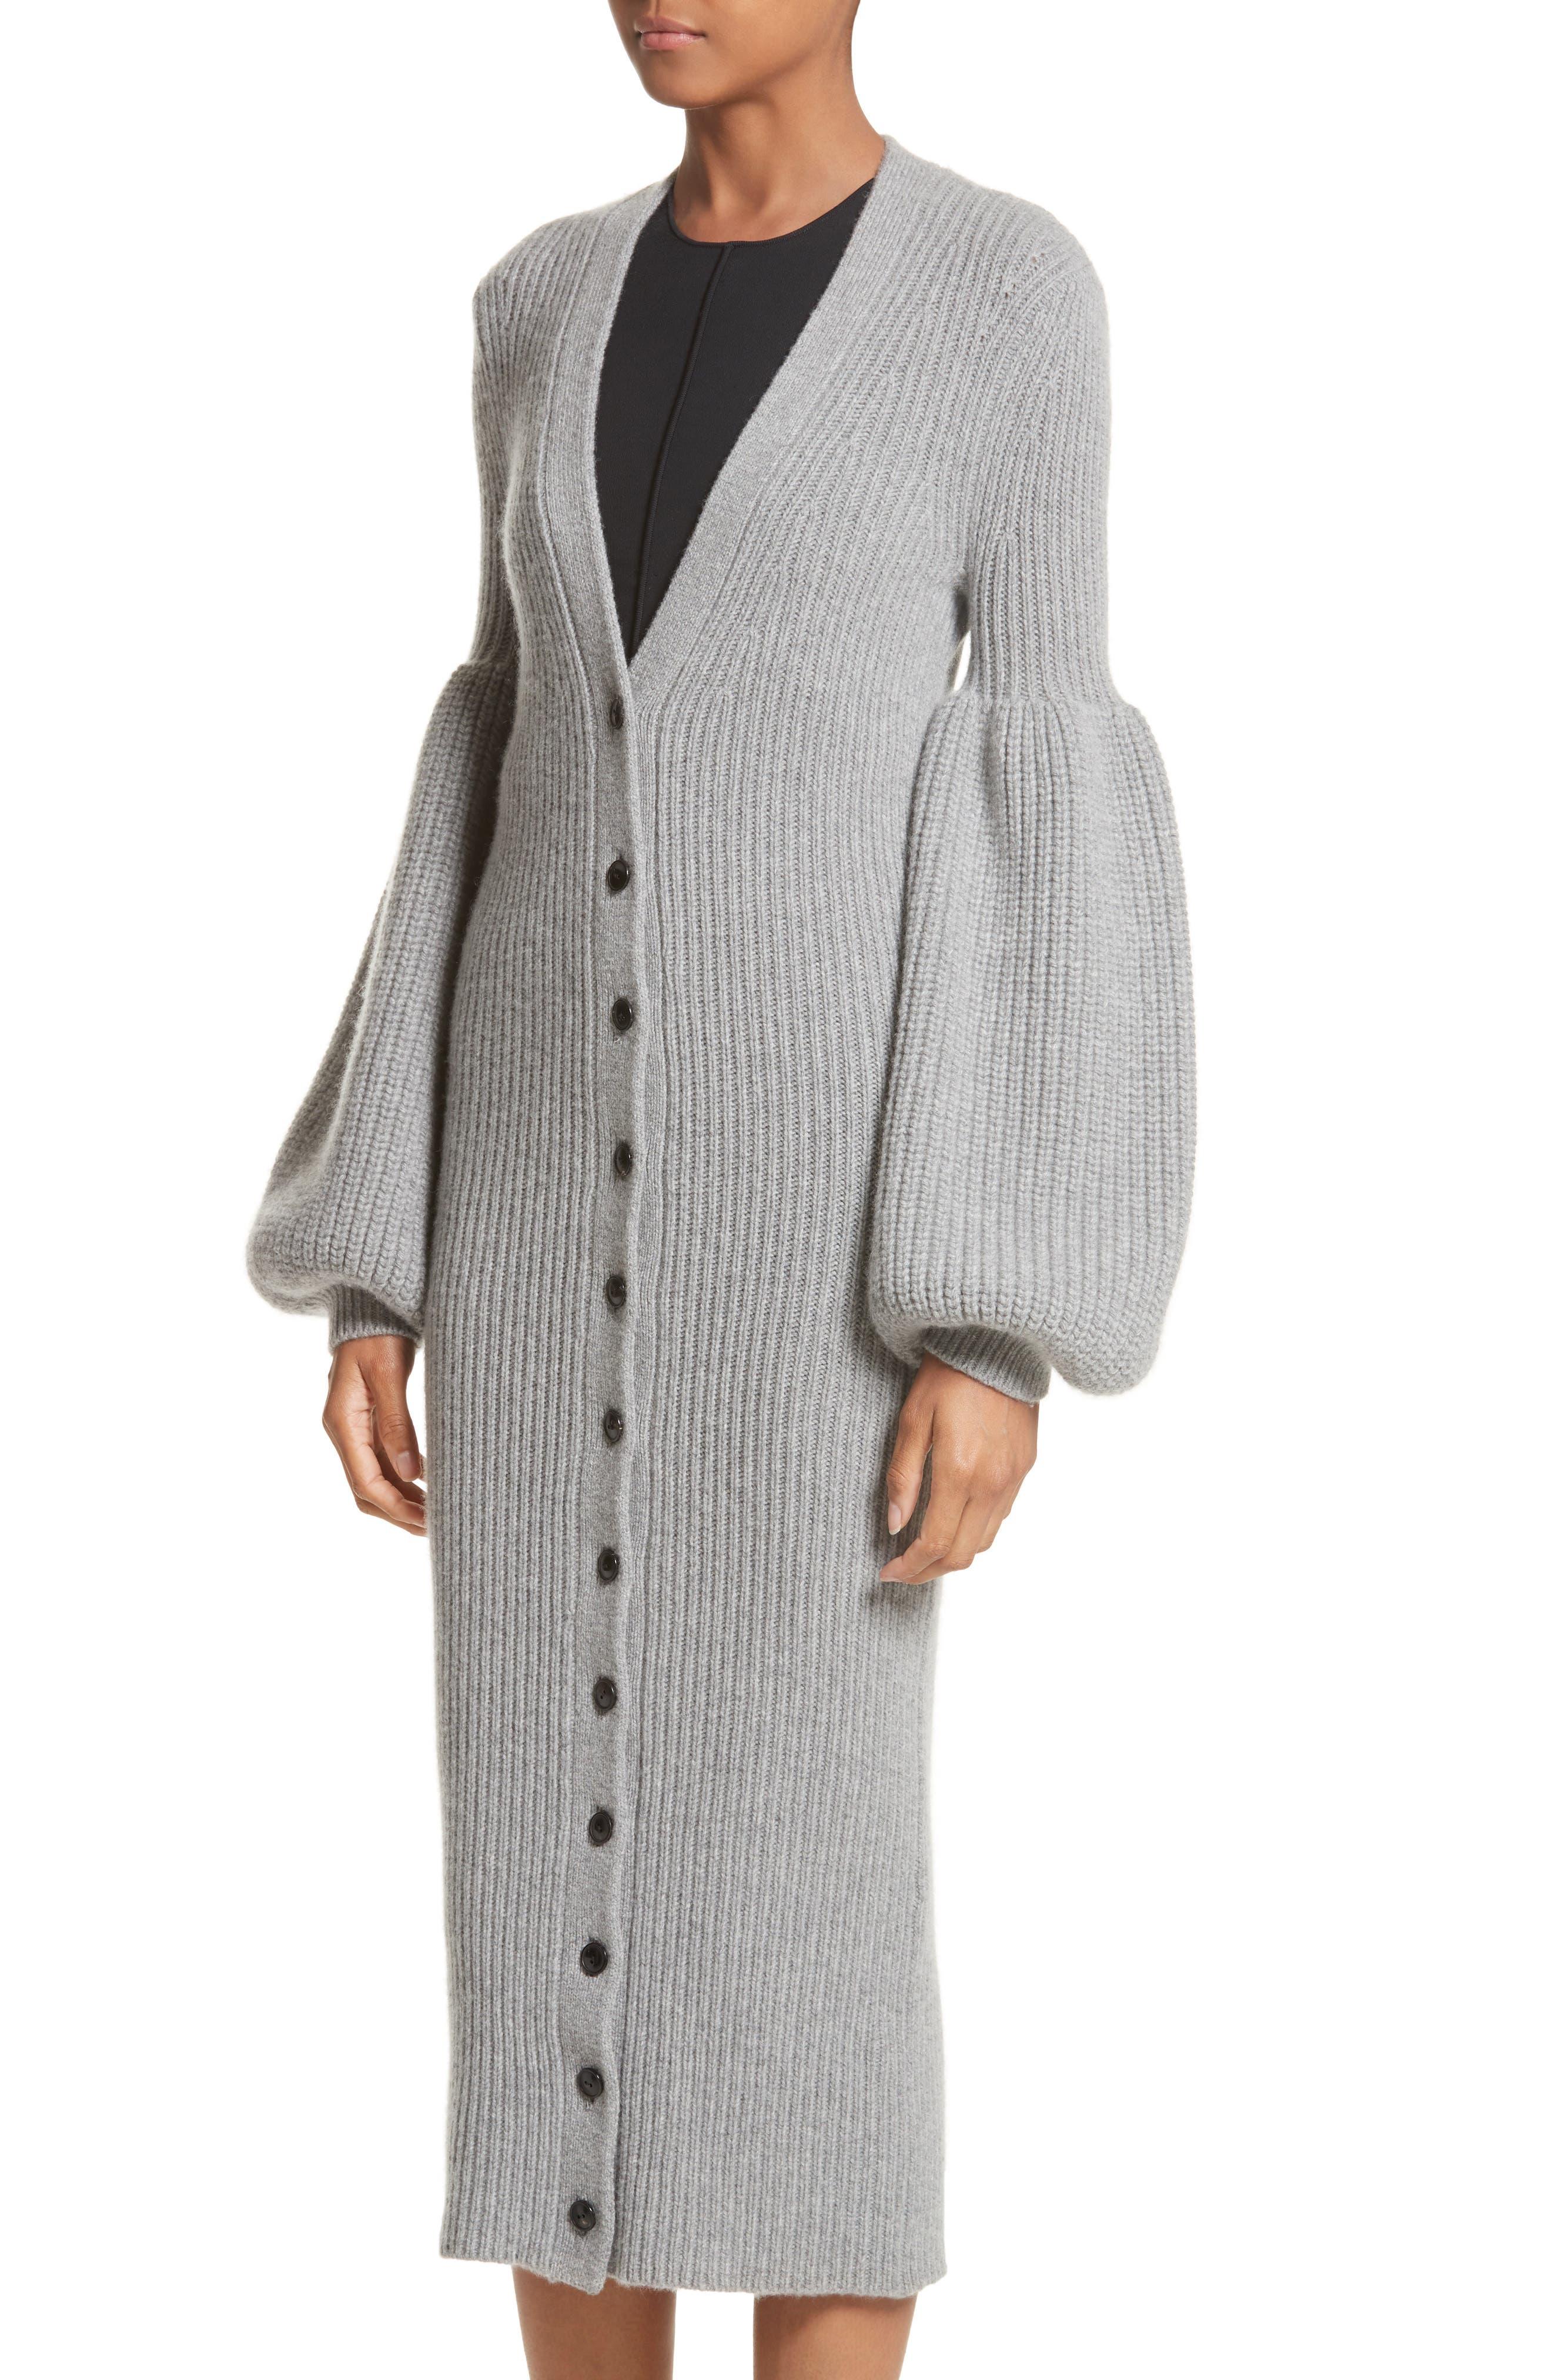 Bishop Sleeve Cardigan,                             Alternate thumbnail 4, color,                             Grey Melange